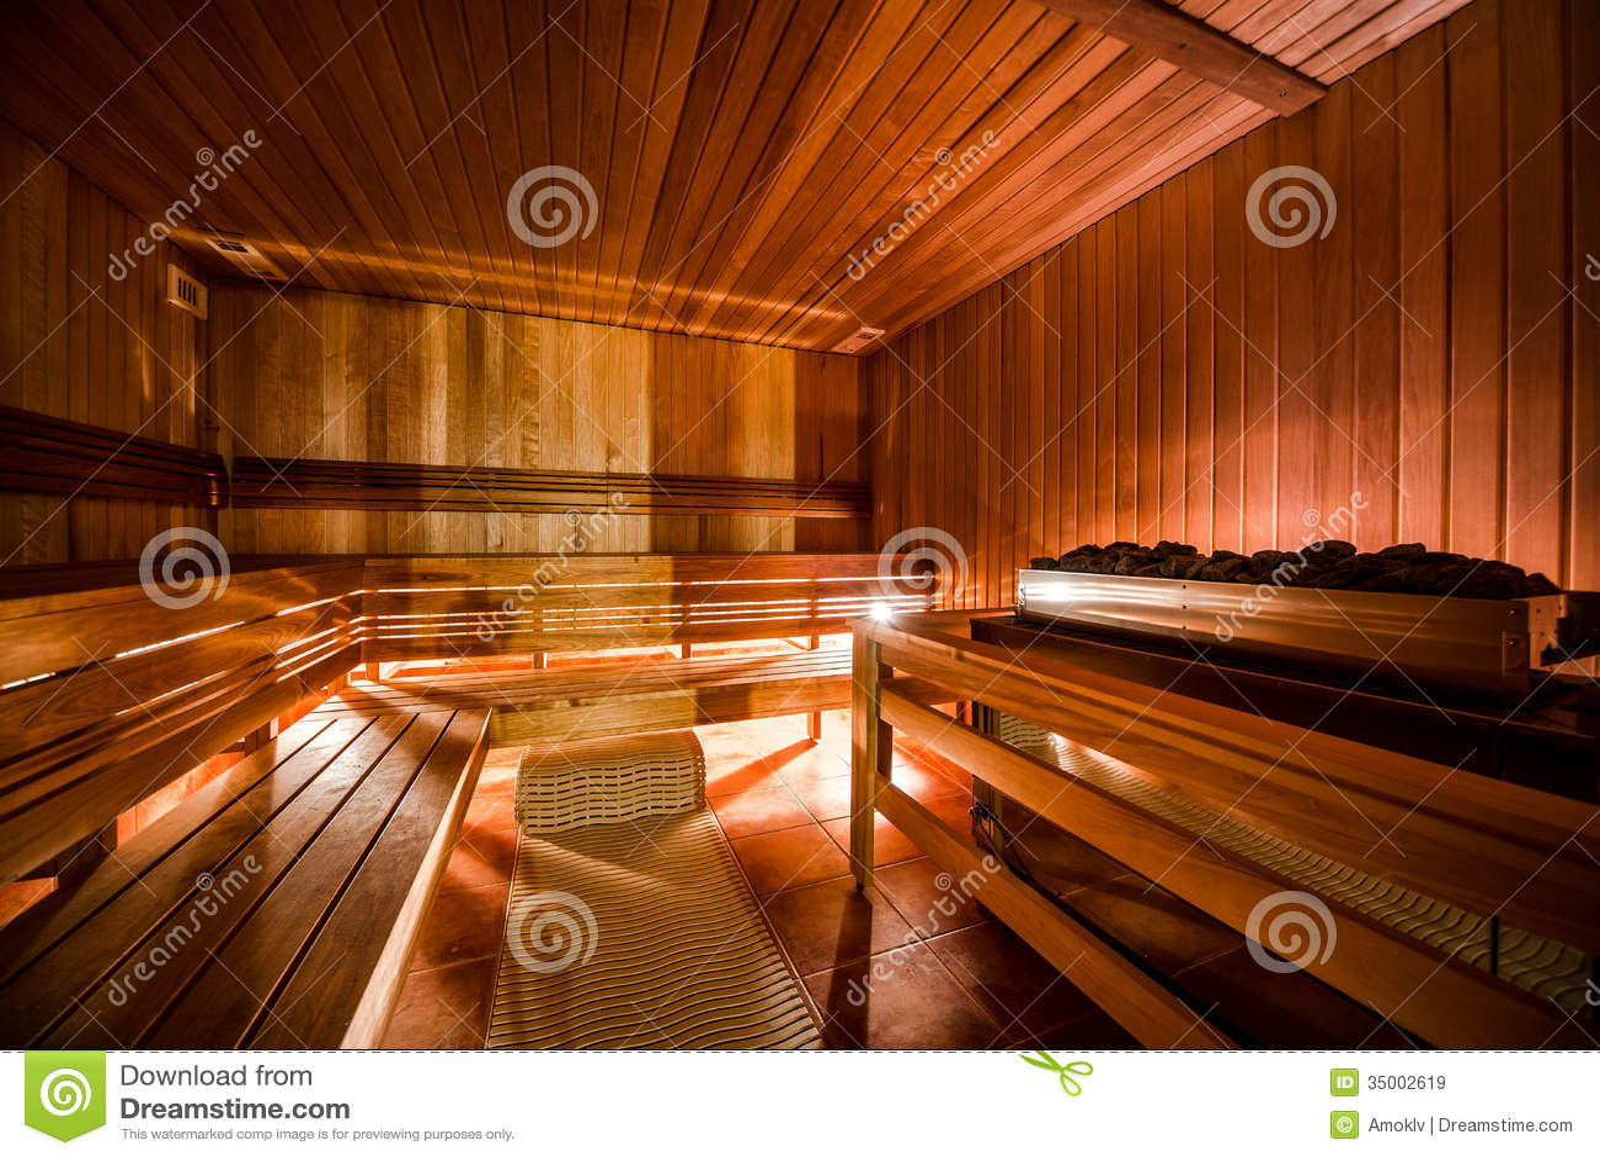 Sauna finlandais images libres de droits image 35002619 - Sauna finlandais prix ...